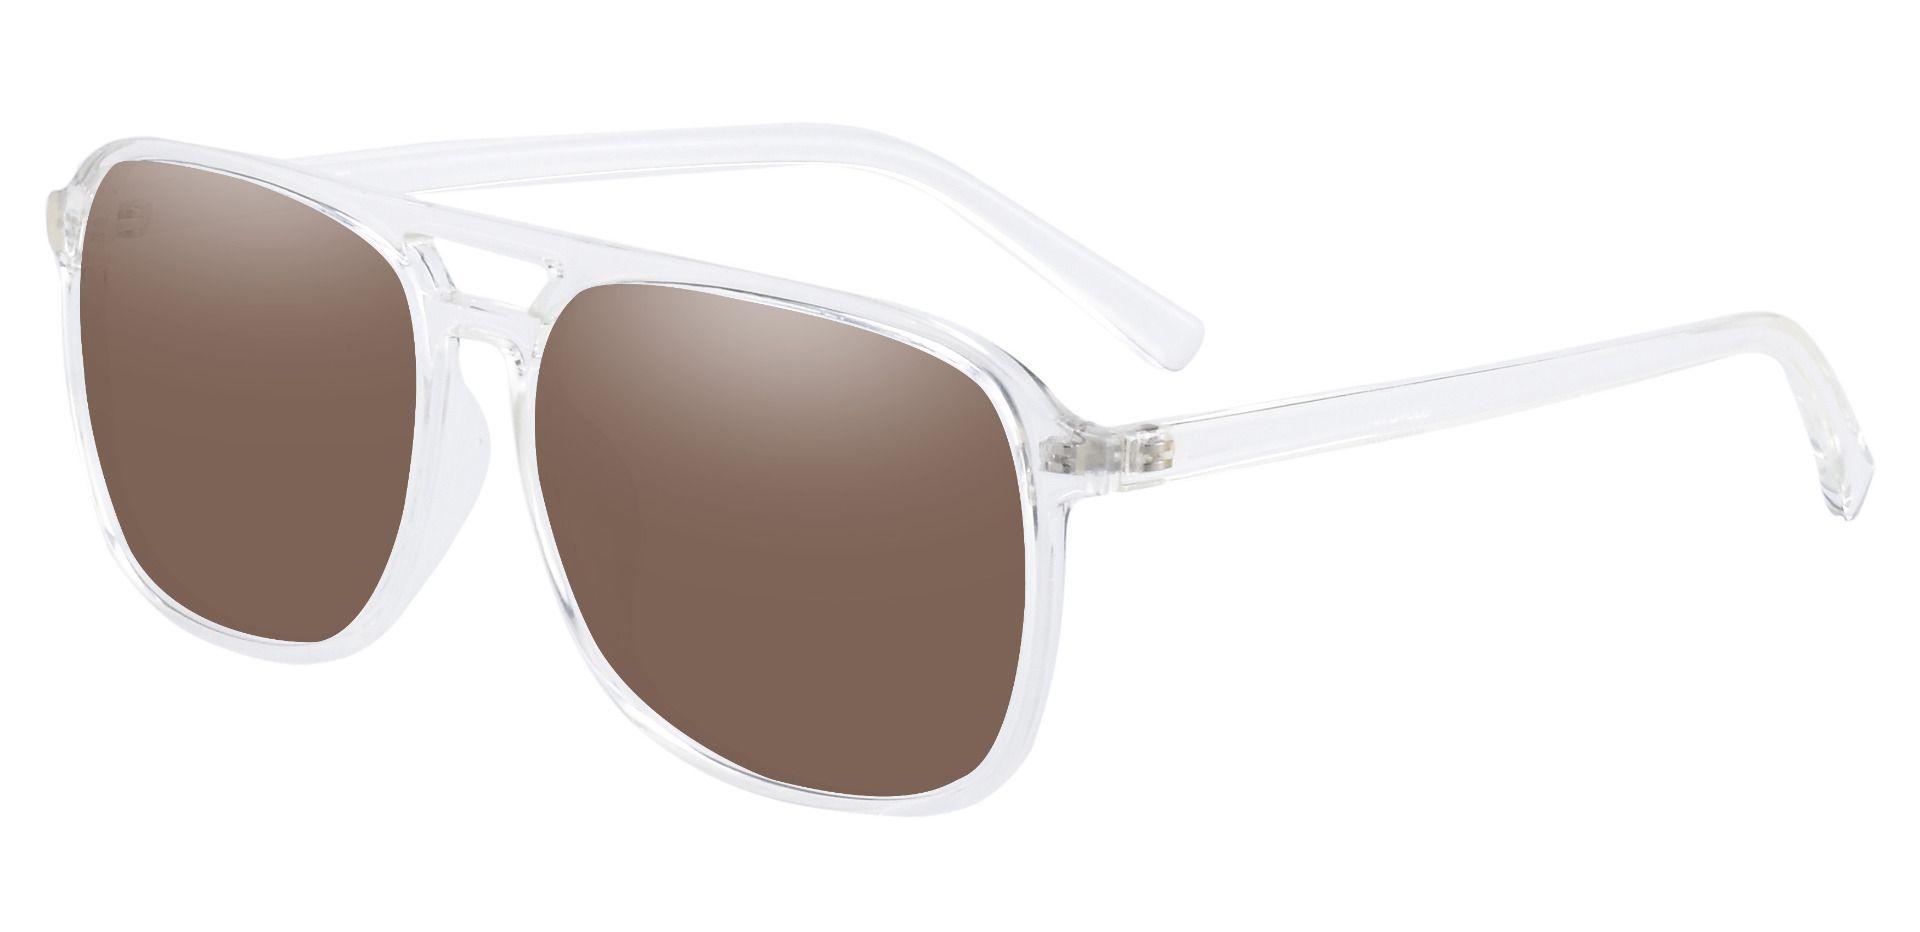 Edward Aviator Prescription Sunglasses -  Clear Frame With Brown Lenses